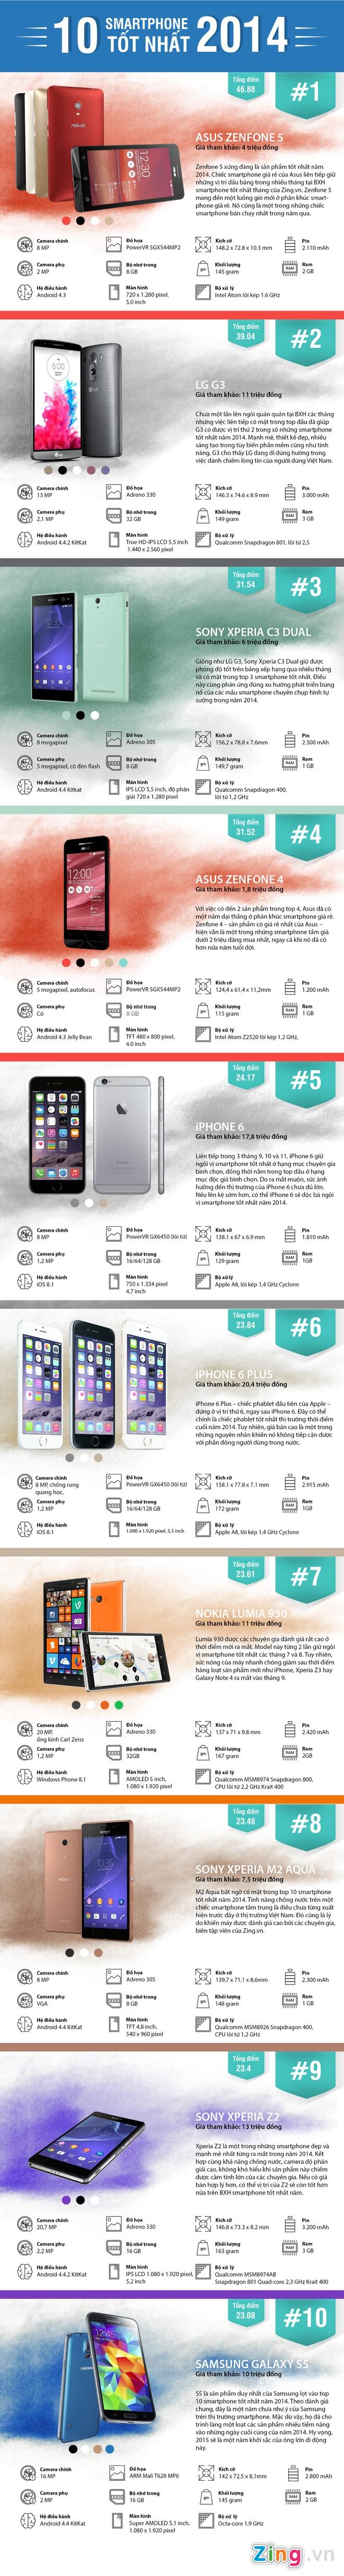 Zenfone 5 la smartphone tot nhat 2014 tai Viet Nam hinh anh 1